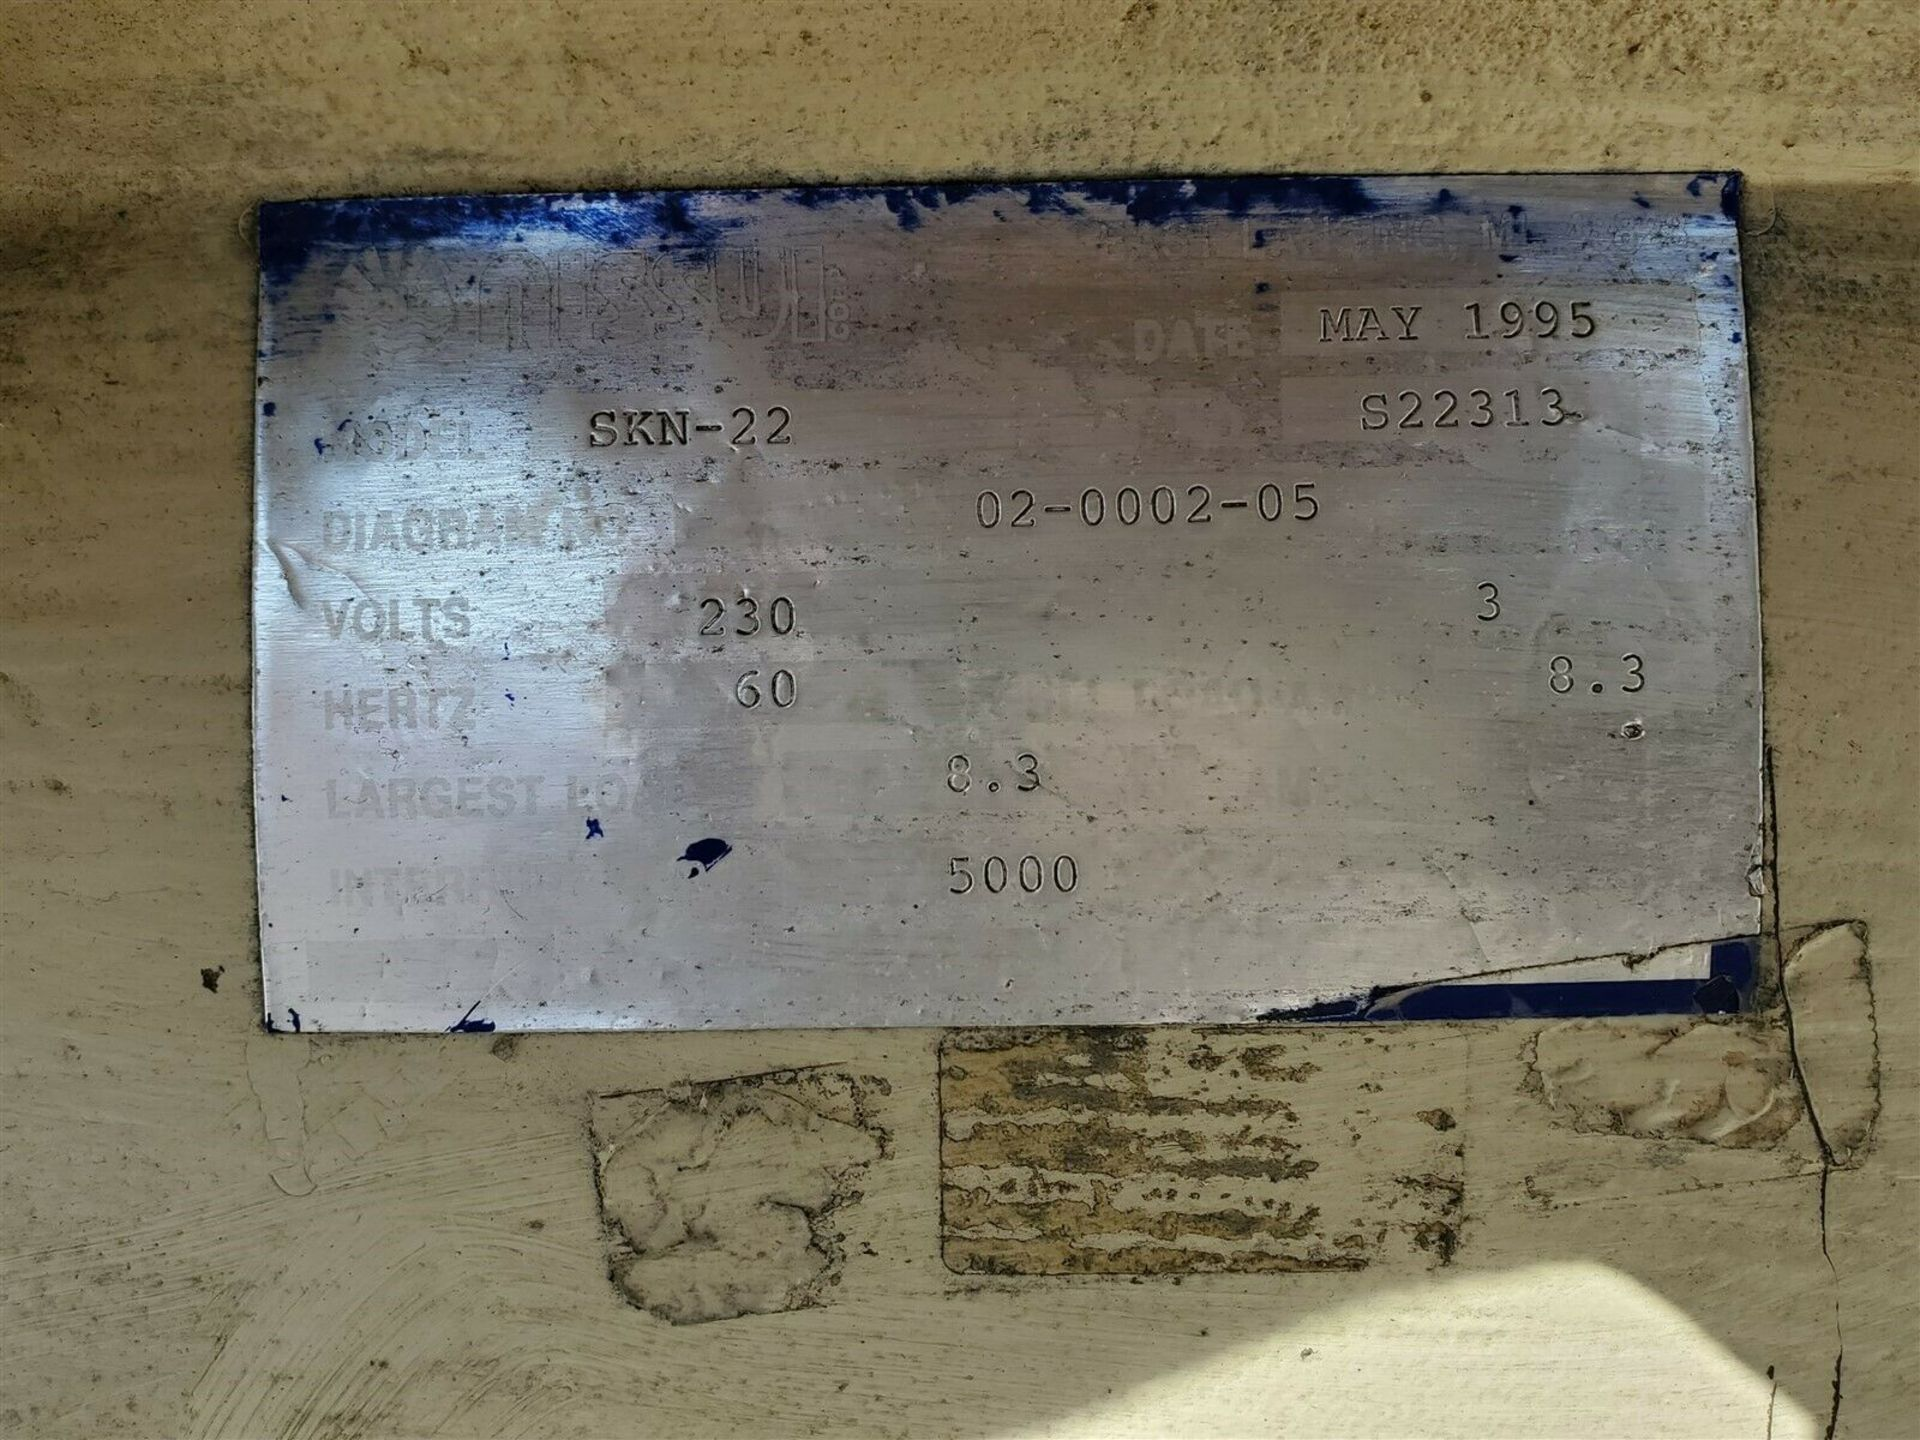 "3hp NISSUI CORP SKN-22 PORTABLE 15"" PLASTIC GRANULATOR CUTTER GRINDER - Image 3 of 4"